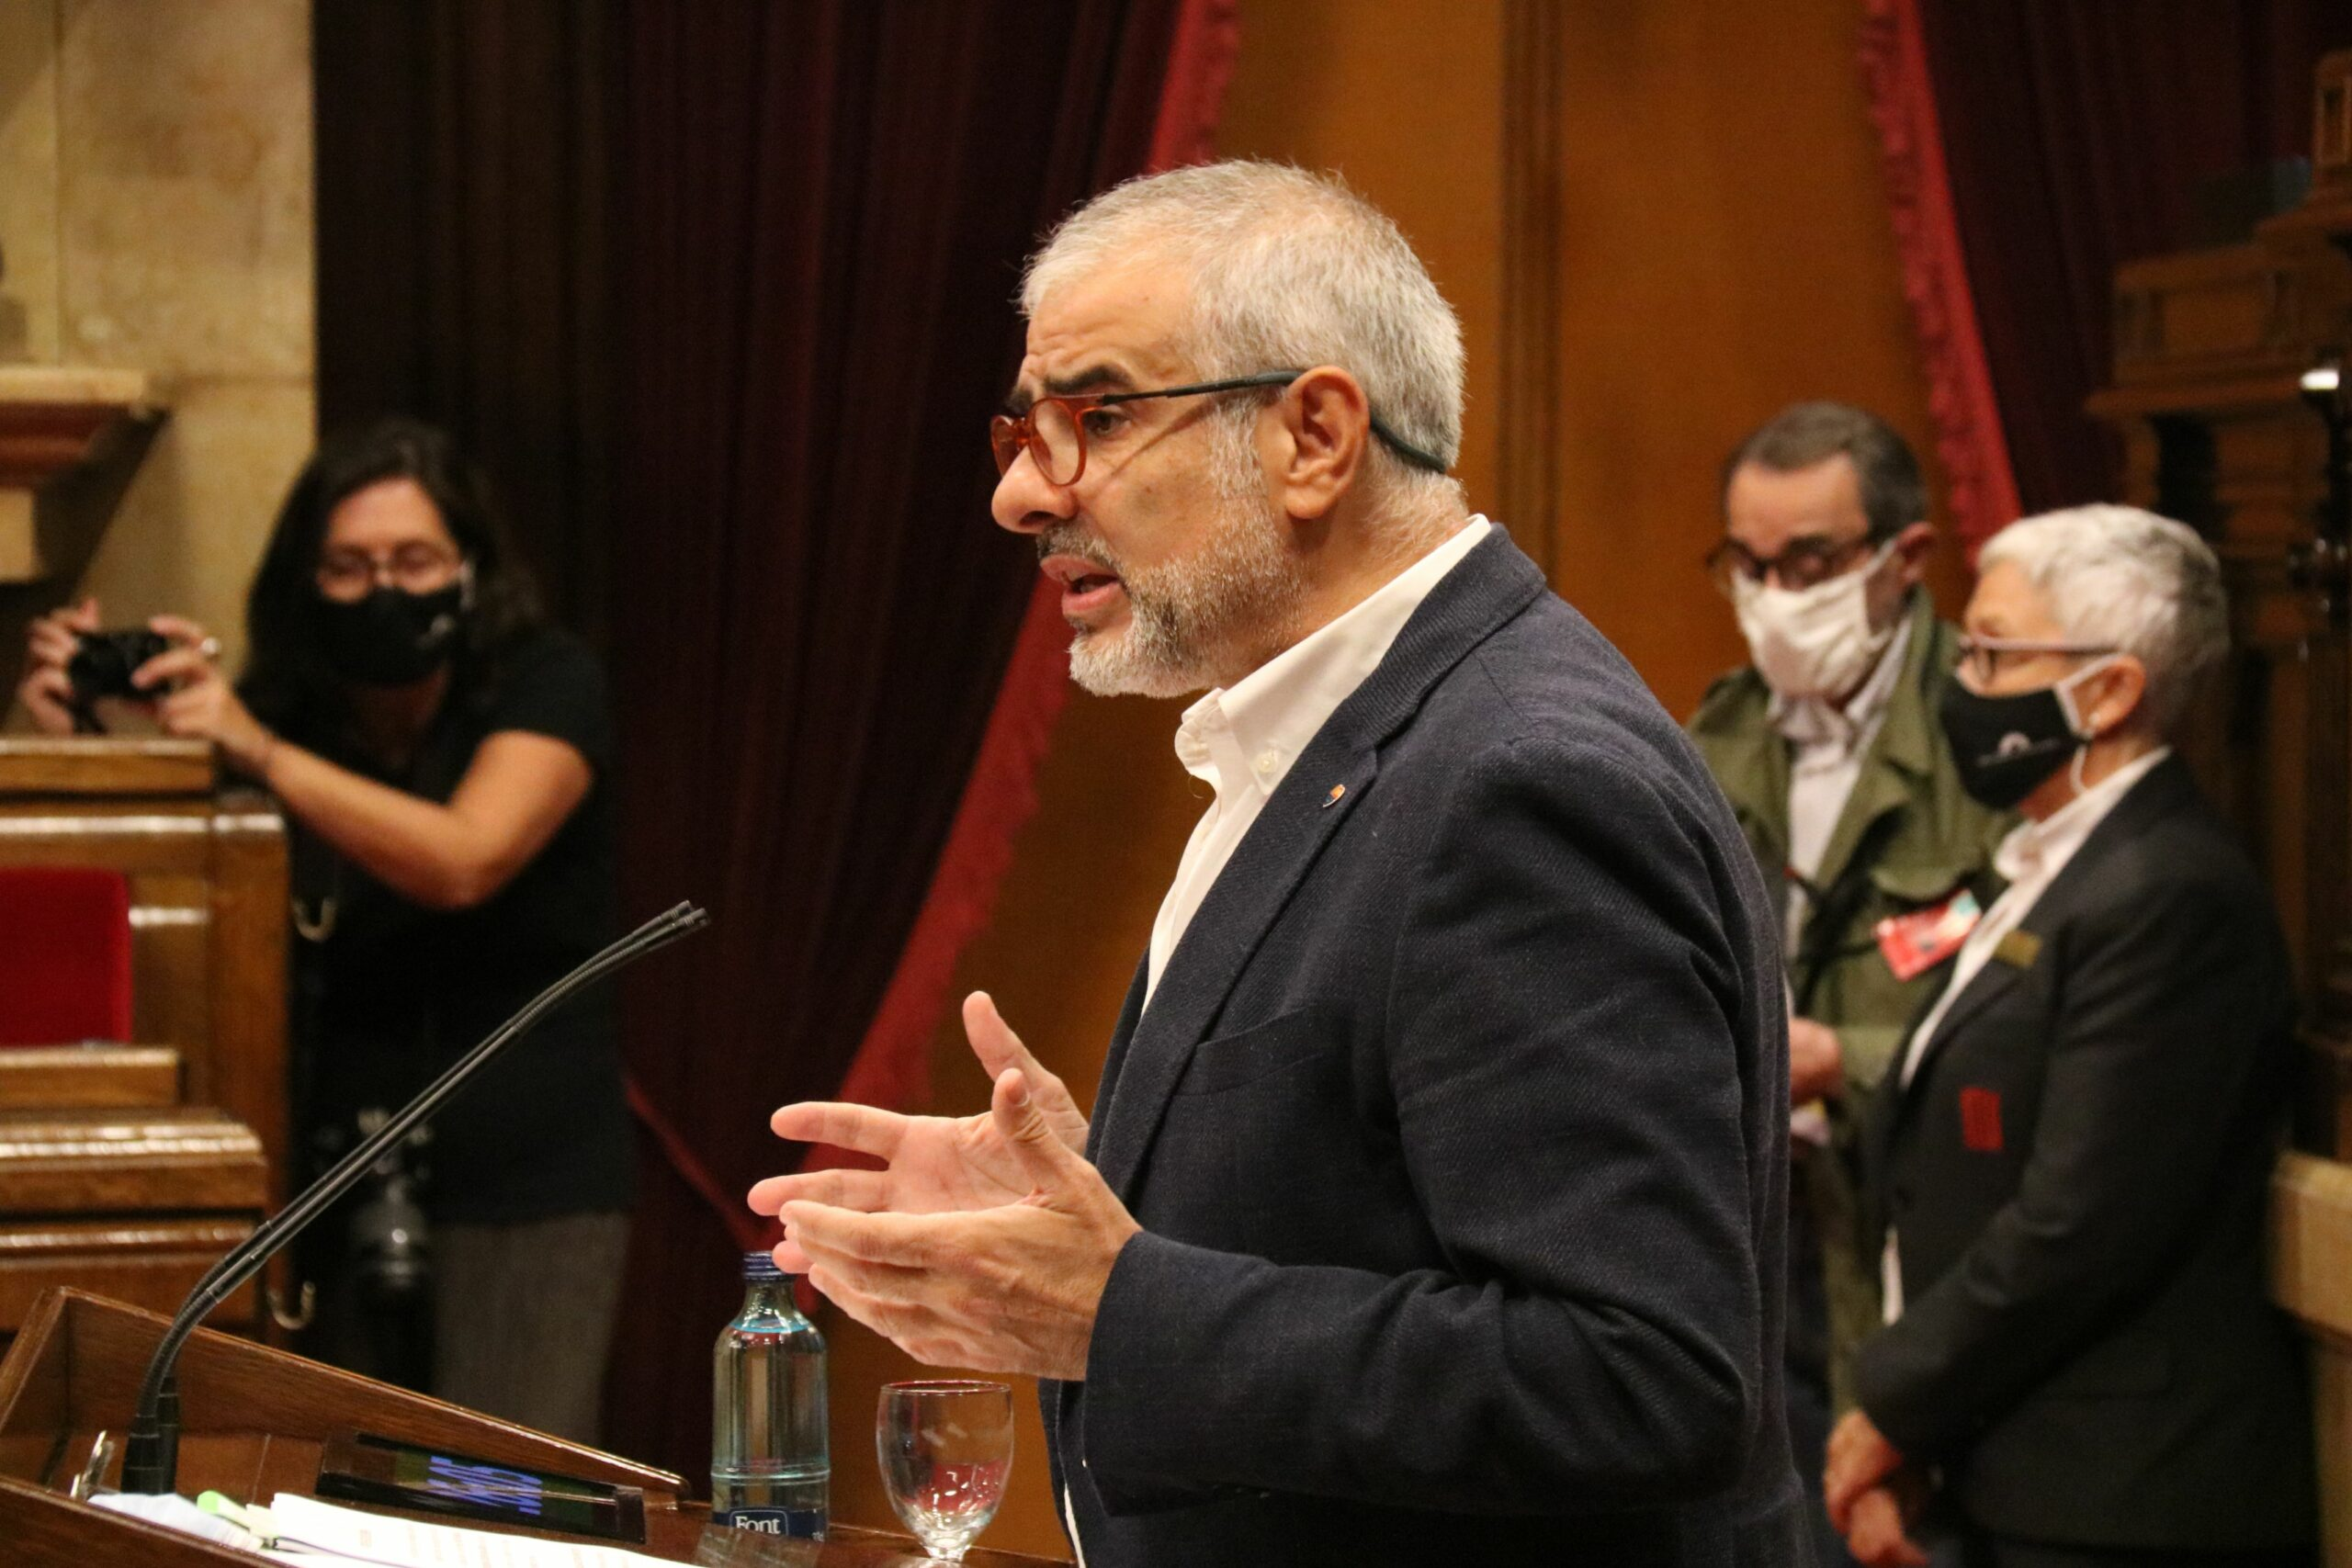 El president del grup parlamentari de Cs, Carlos Carrizosa ACN